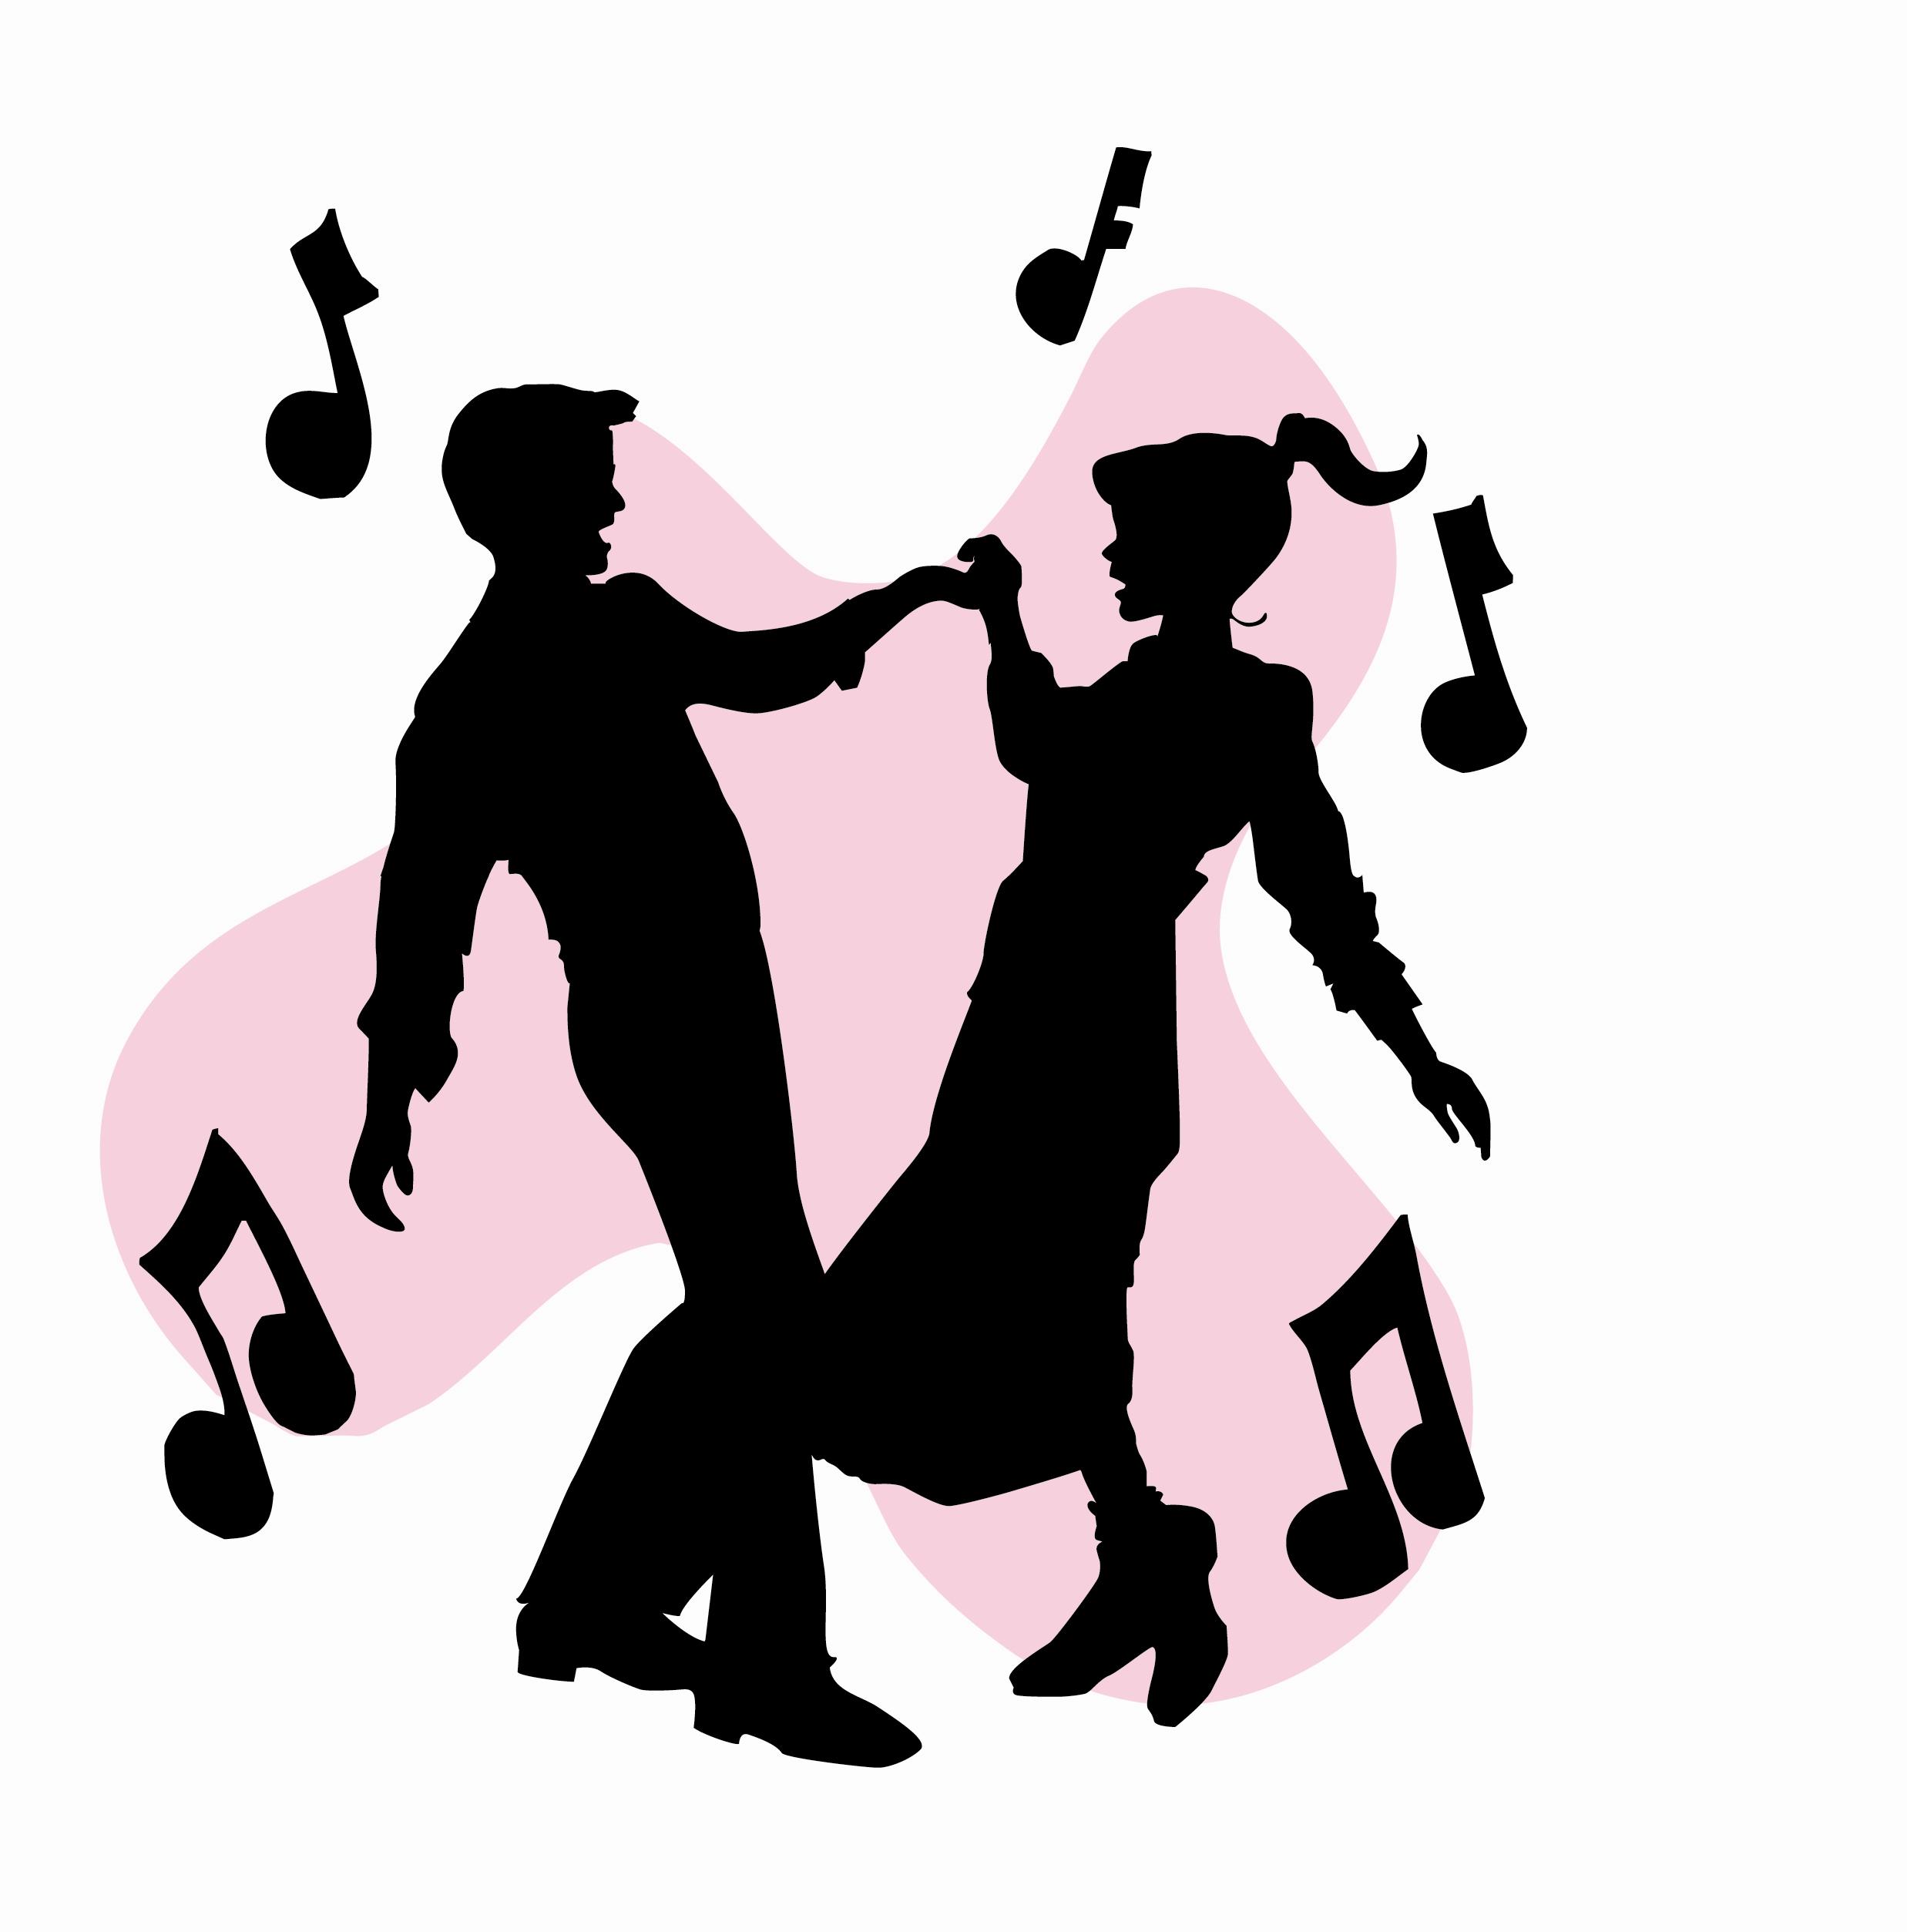 2475x2507 Love Me Tender Couples' Dance